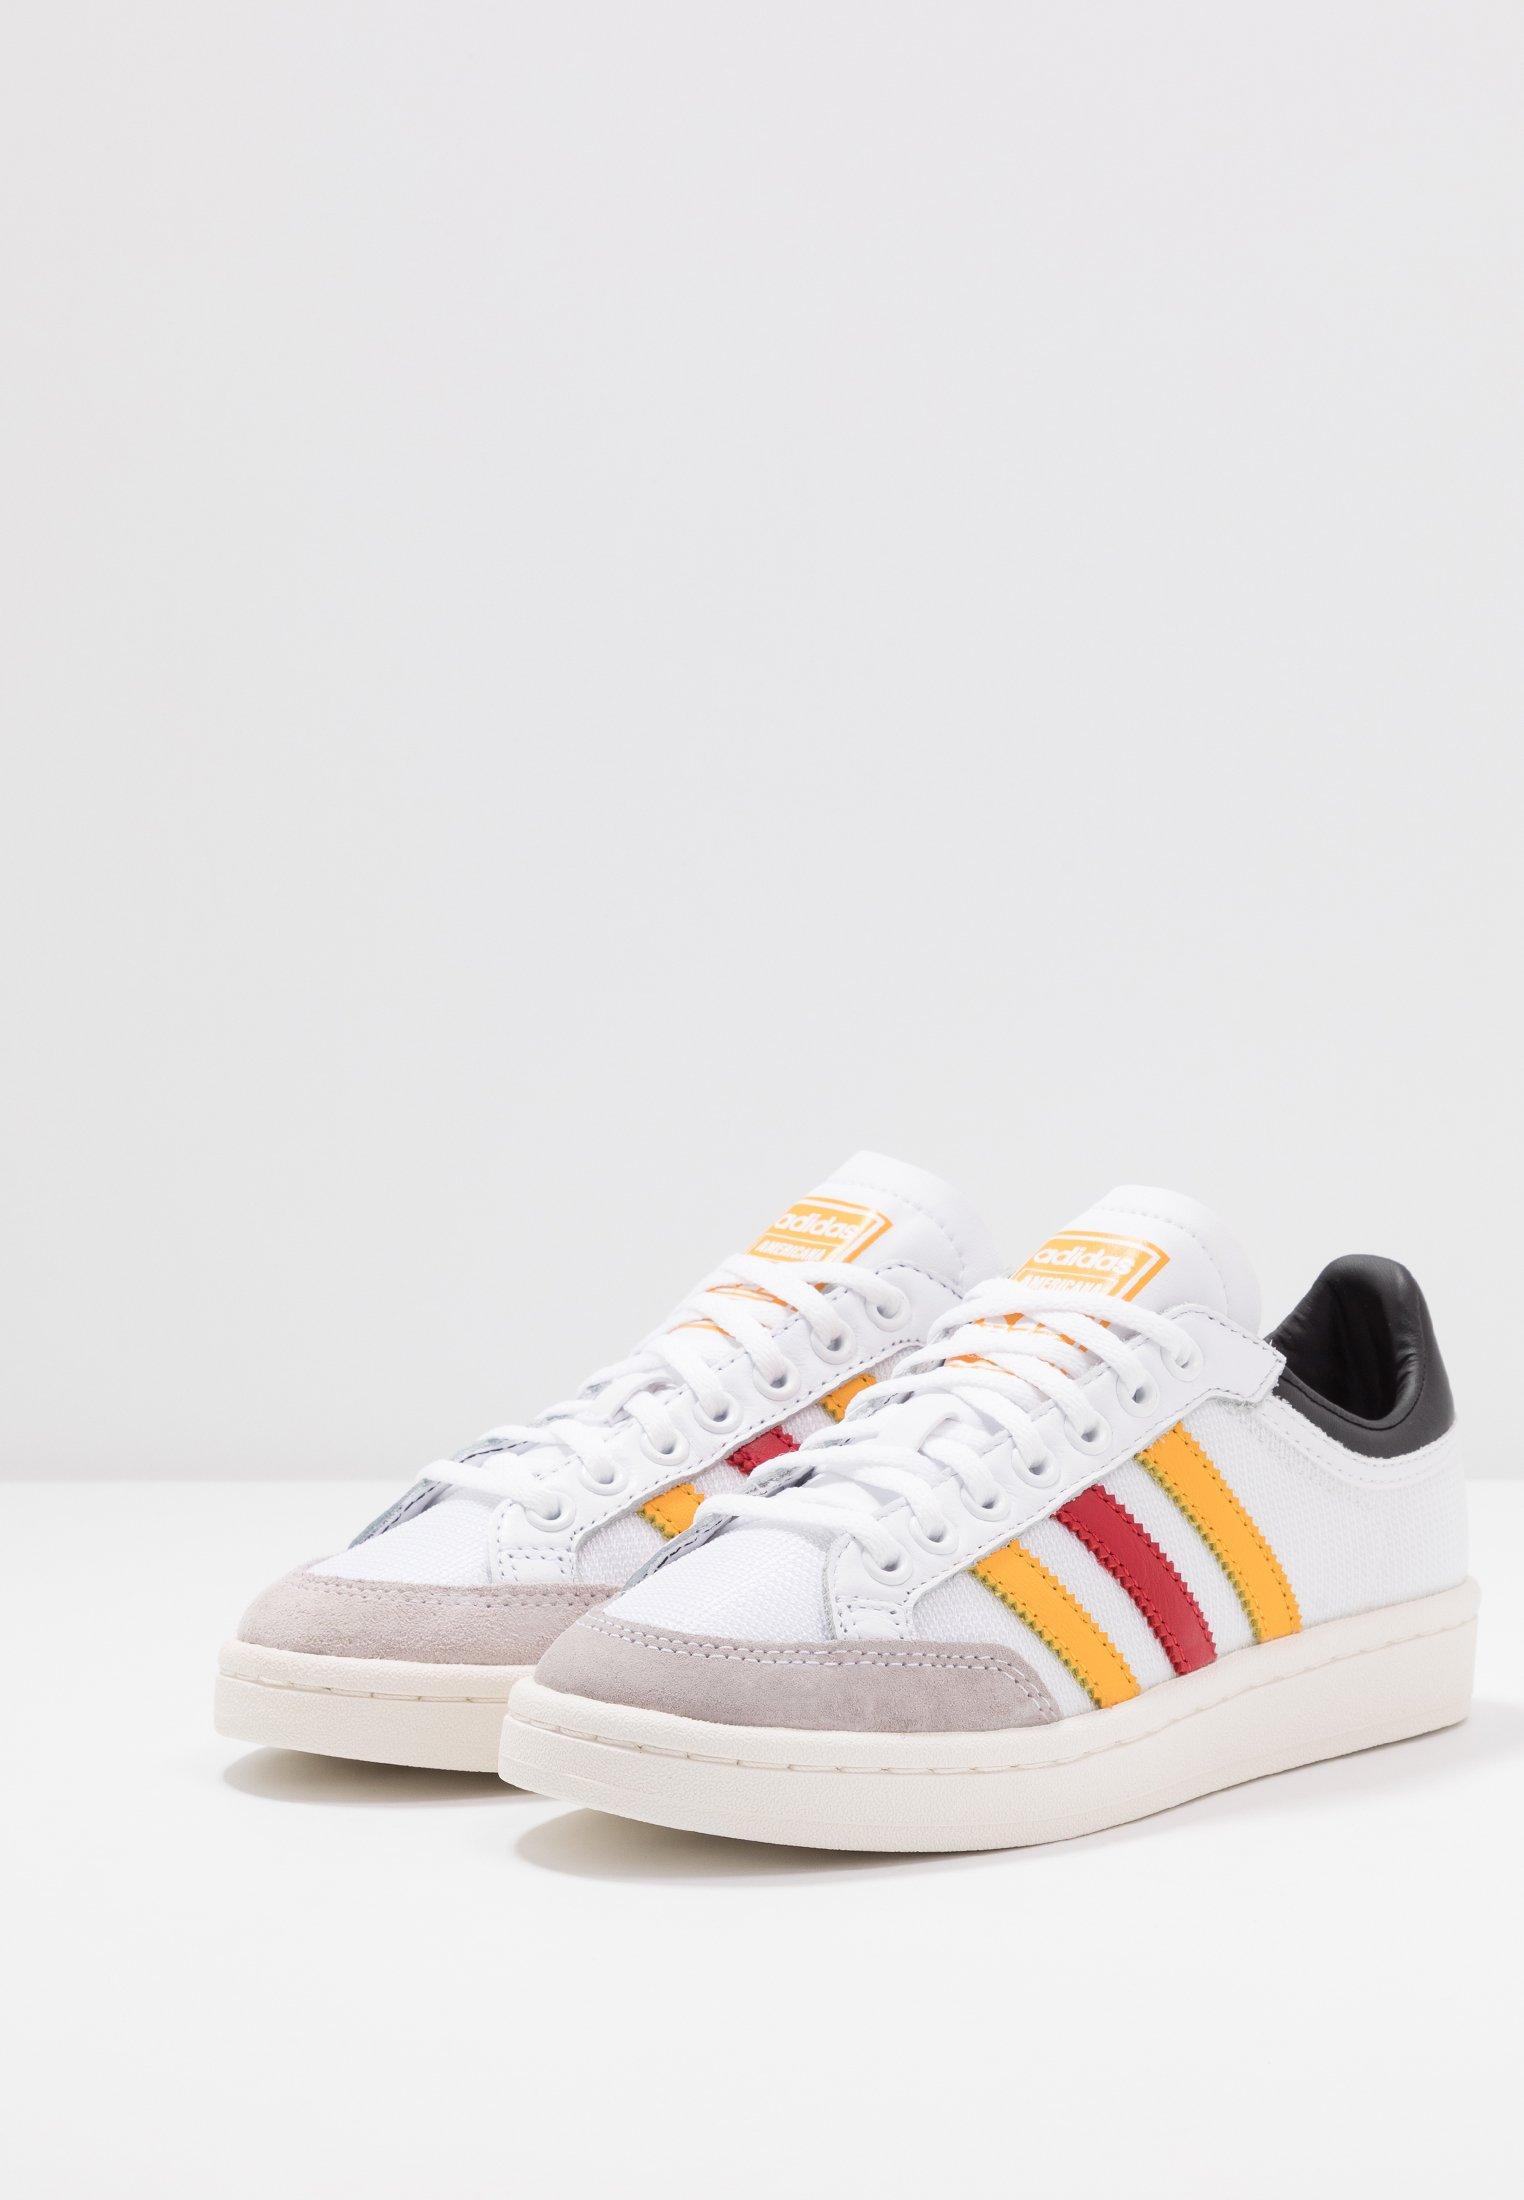 Adidas Originals Americana - Sneaker Low Footware White/active Gold/scarlet Black Friday